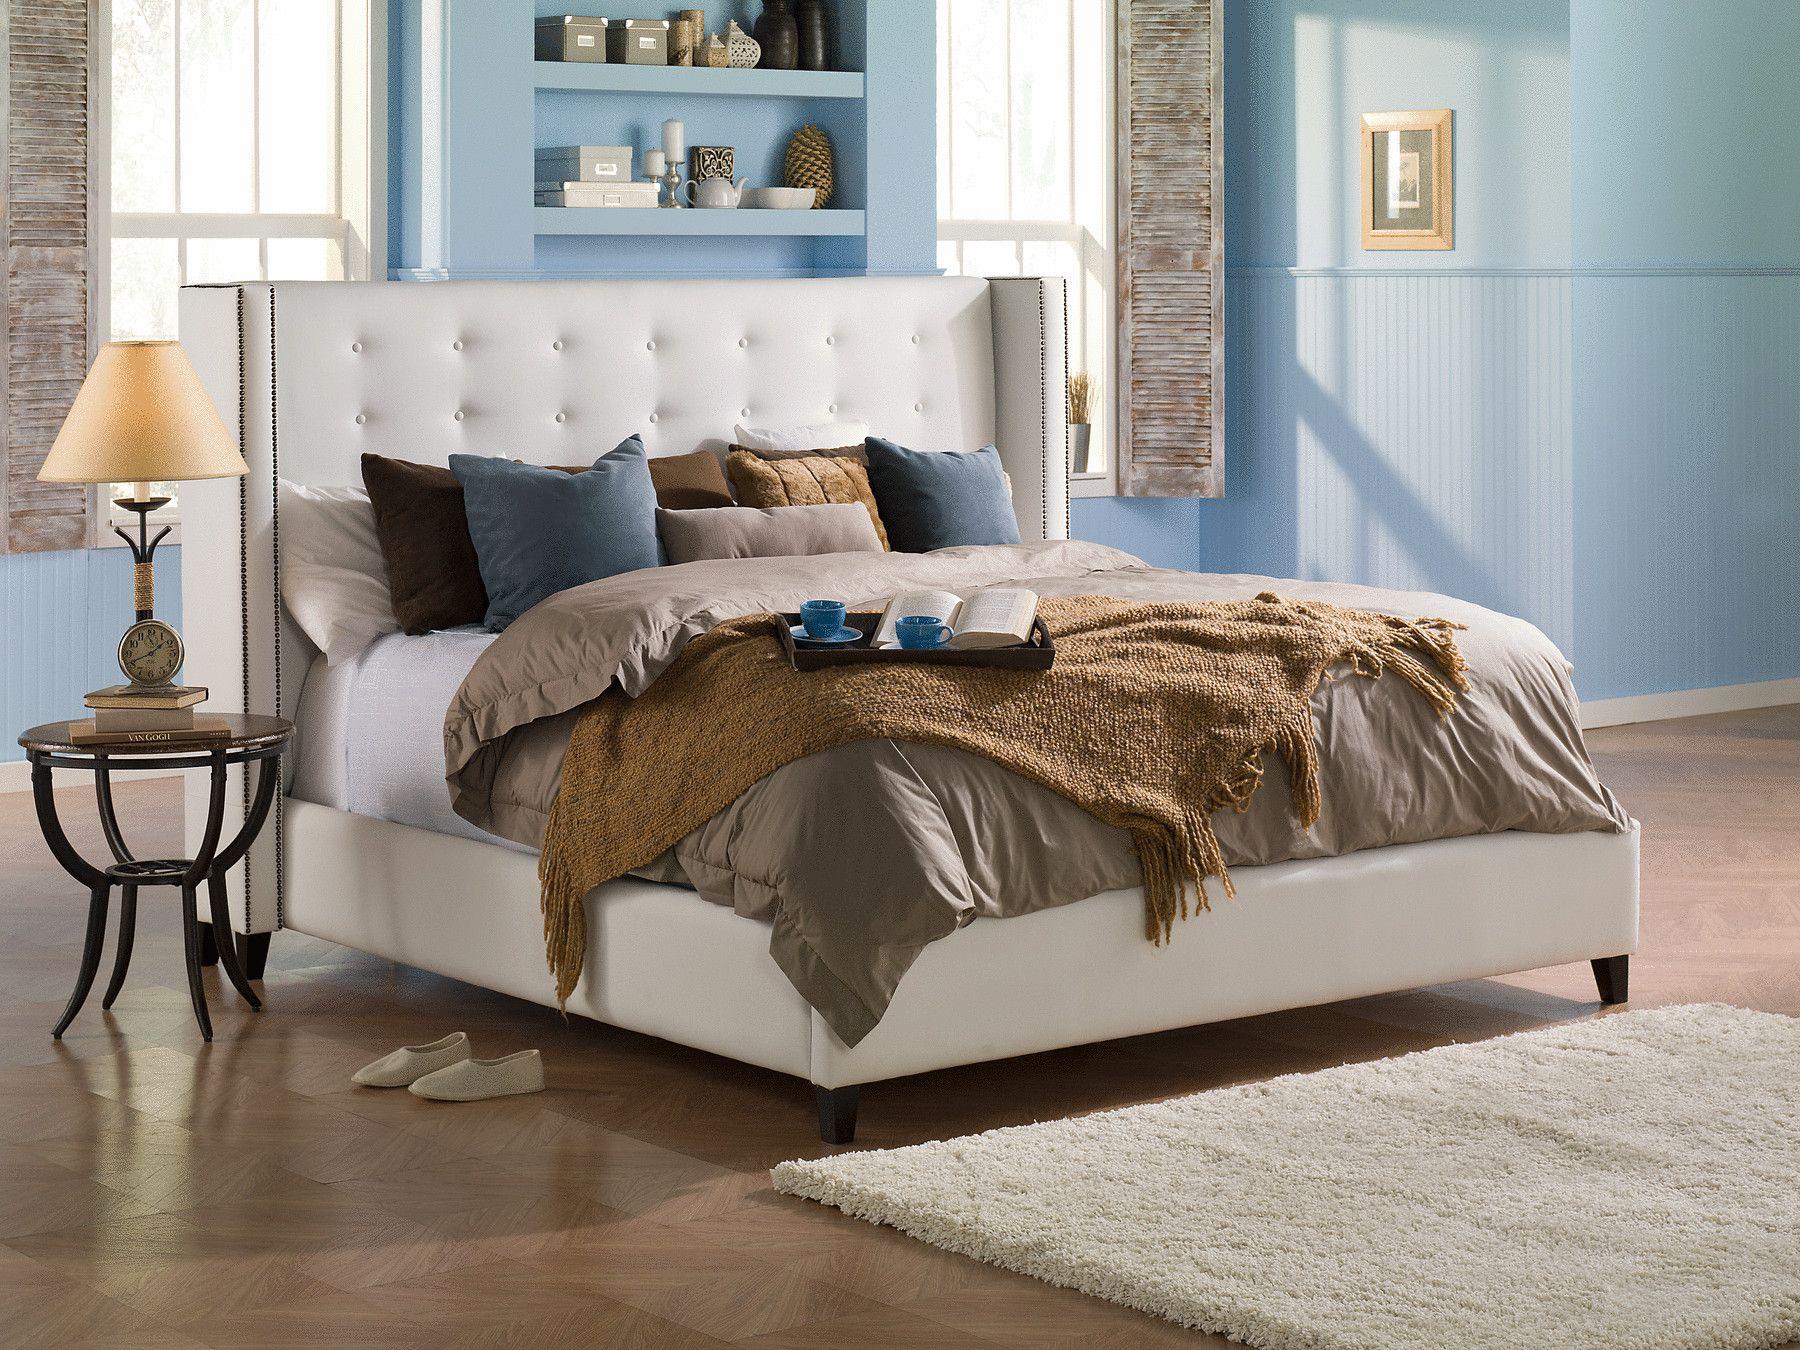 Palliser Rosemont bed. | Bedrooms by Stonesthrow | Pinterest ...